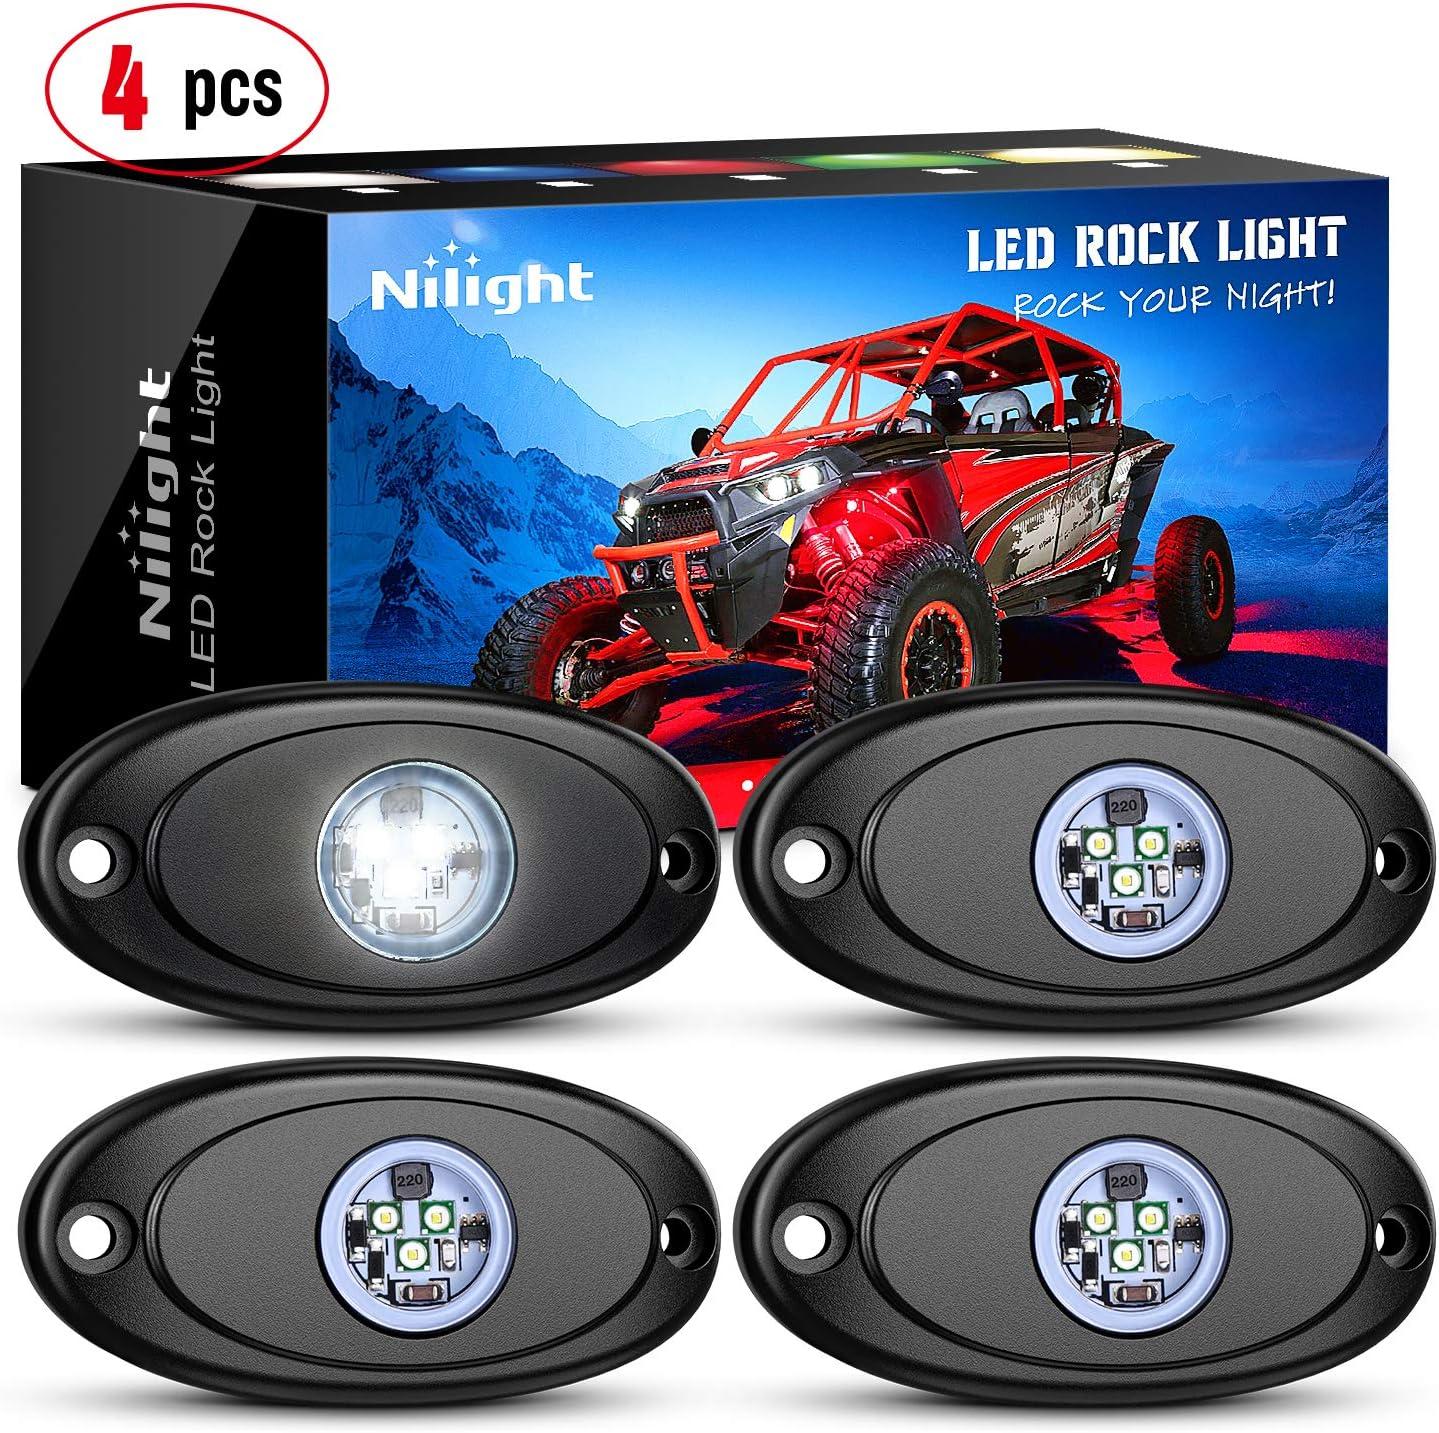 Nilight LED Rock Light 4PCS White Light Pods Waterproof Under Body Wheel Well Light Exterior Interior Lights for Car Truck Pickups ATV UTV SUV Motorcycle Boat, 2 Years Warranty